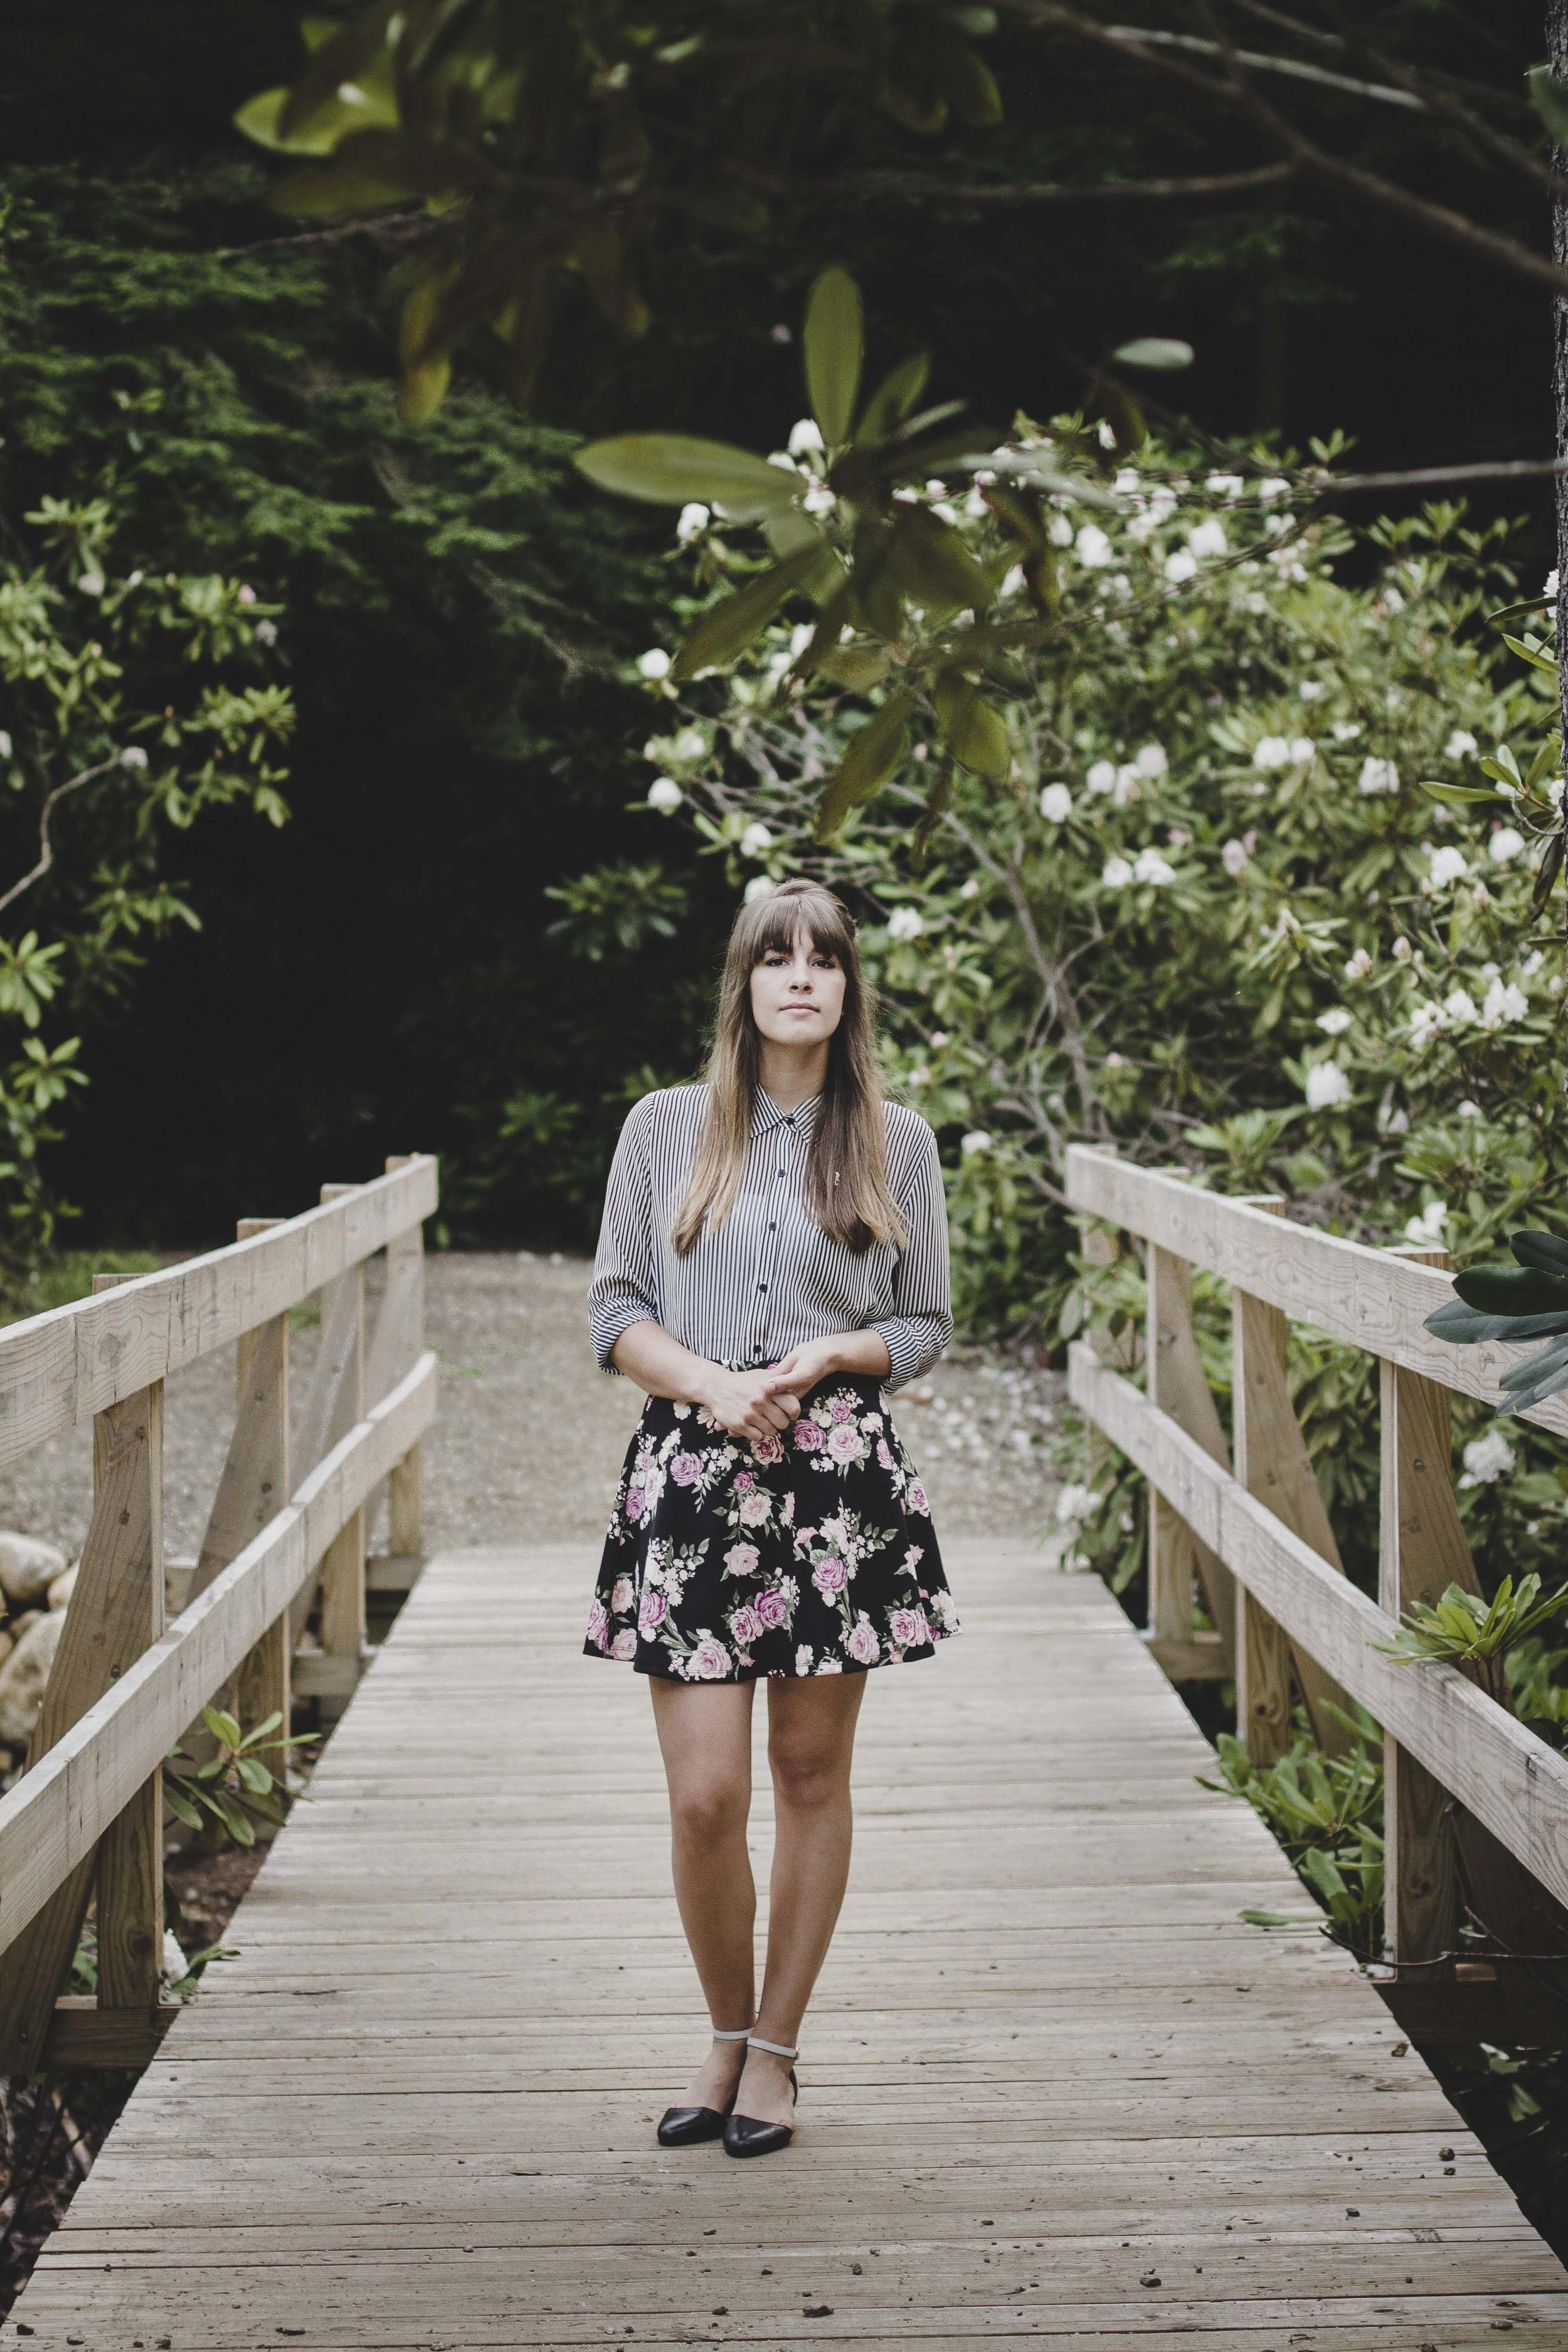 EMILY / by emari traffie